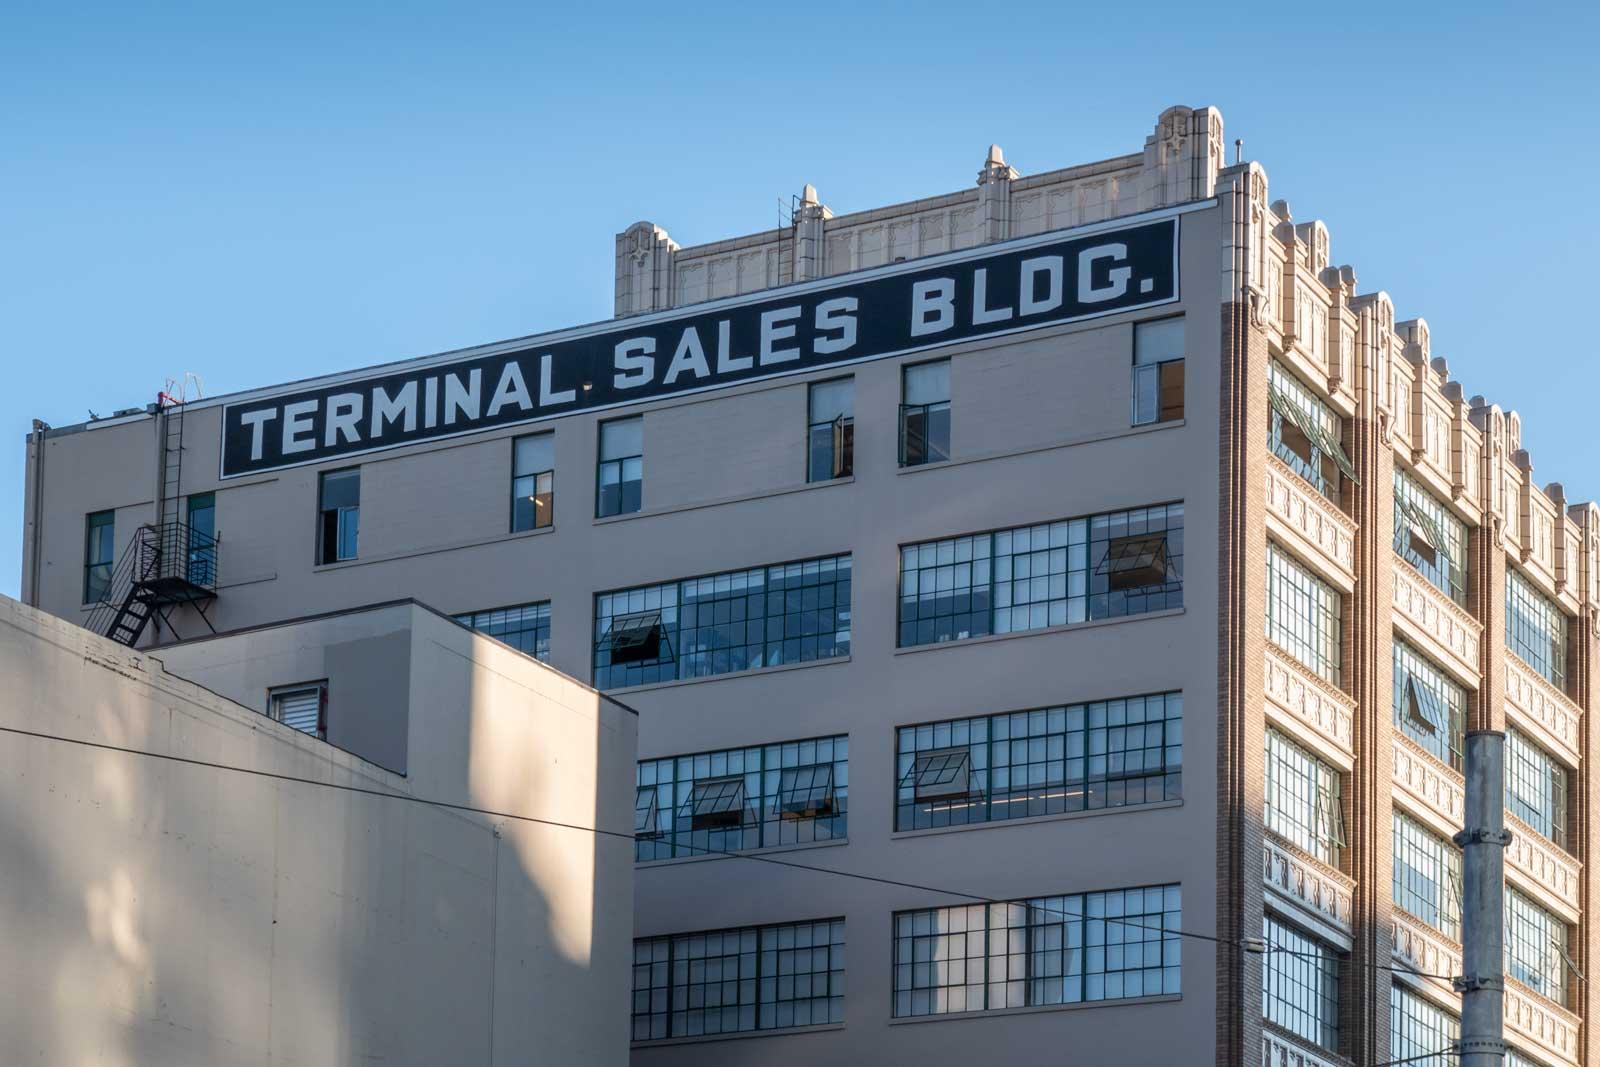 Terminal Sales Building Seattle